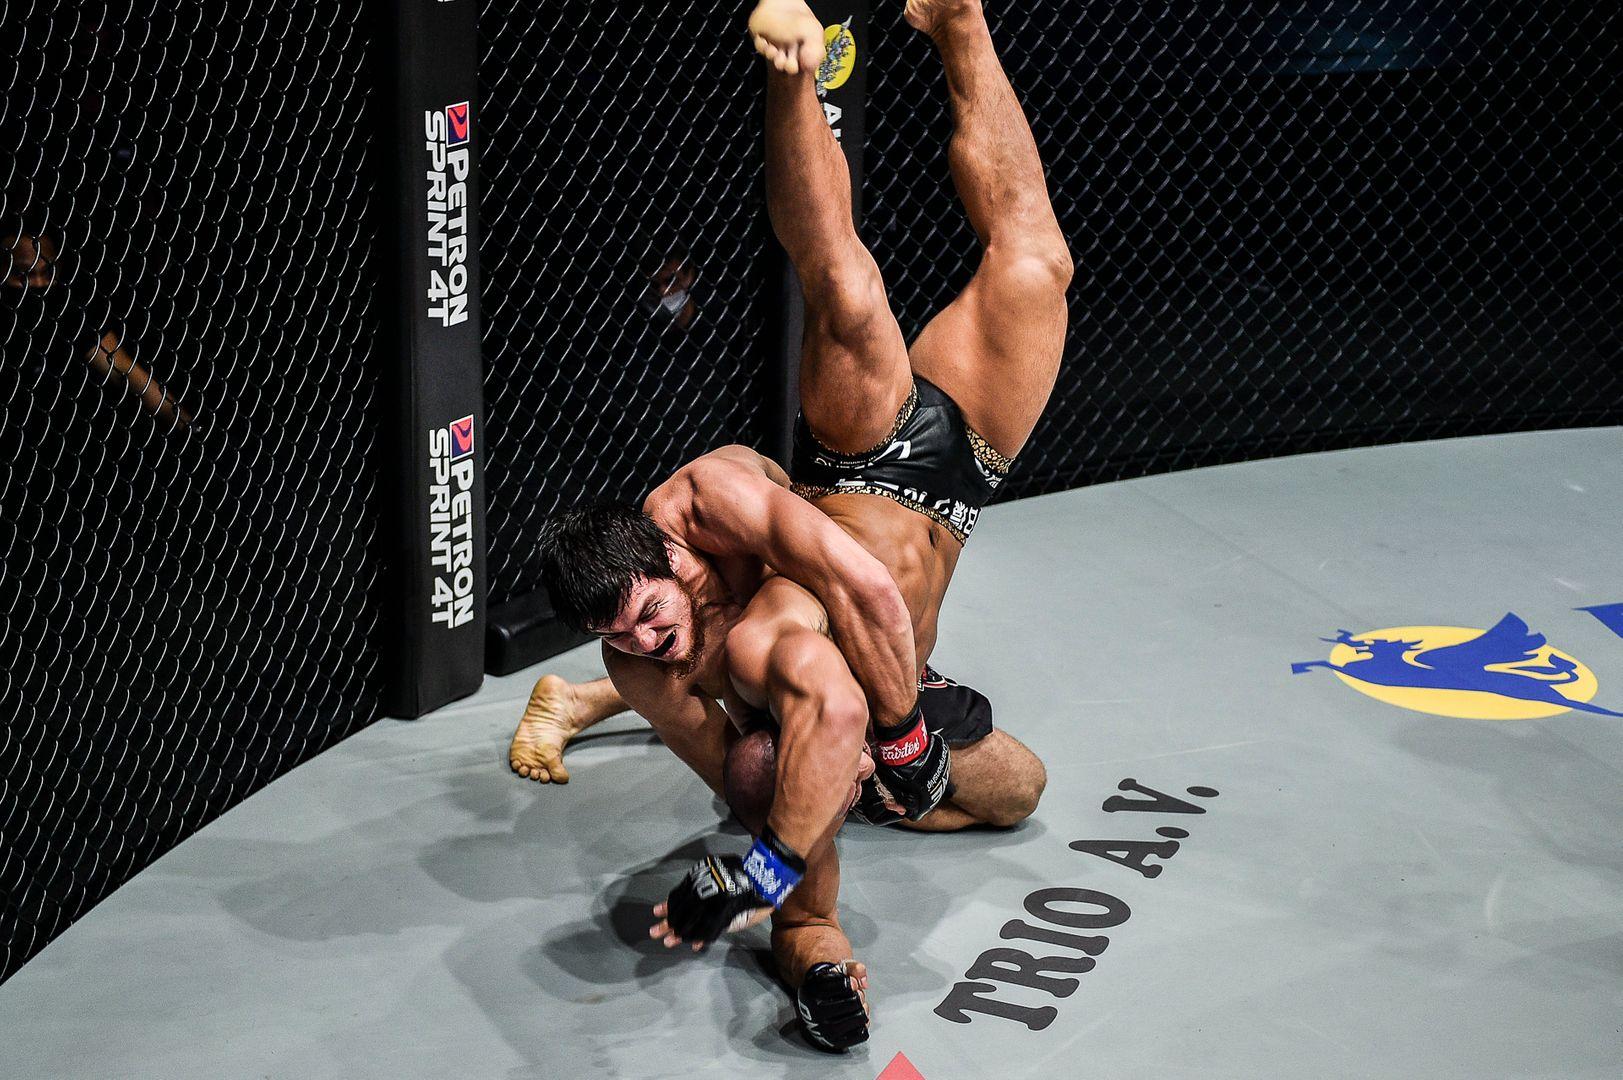 Russian MMA fighter Murad Ramazanov squares off against Hiroyuki Tetsuka at ONE: INSIDE THE MATRIX III